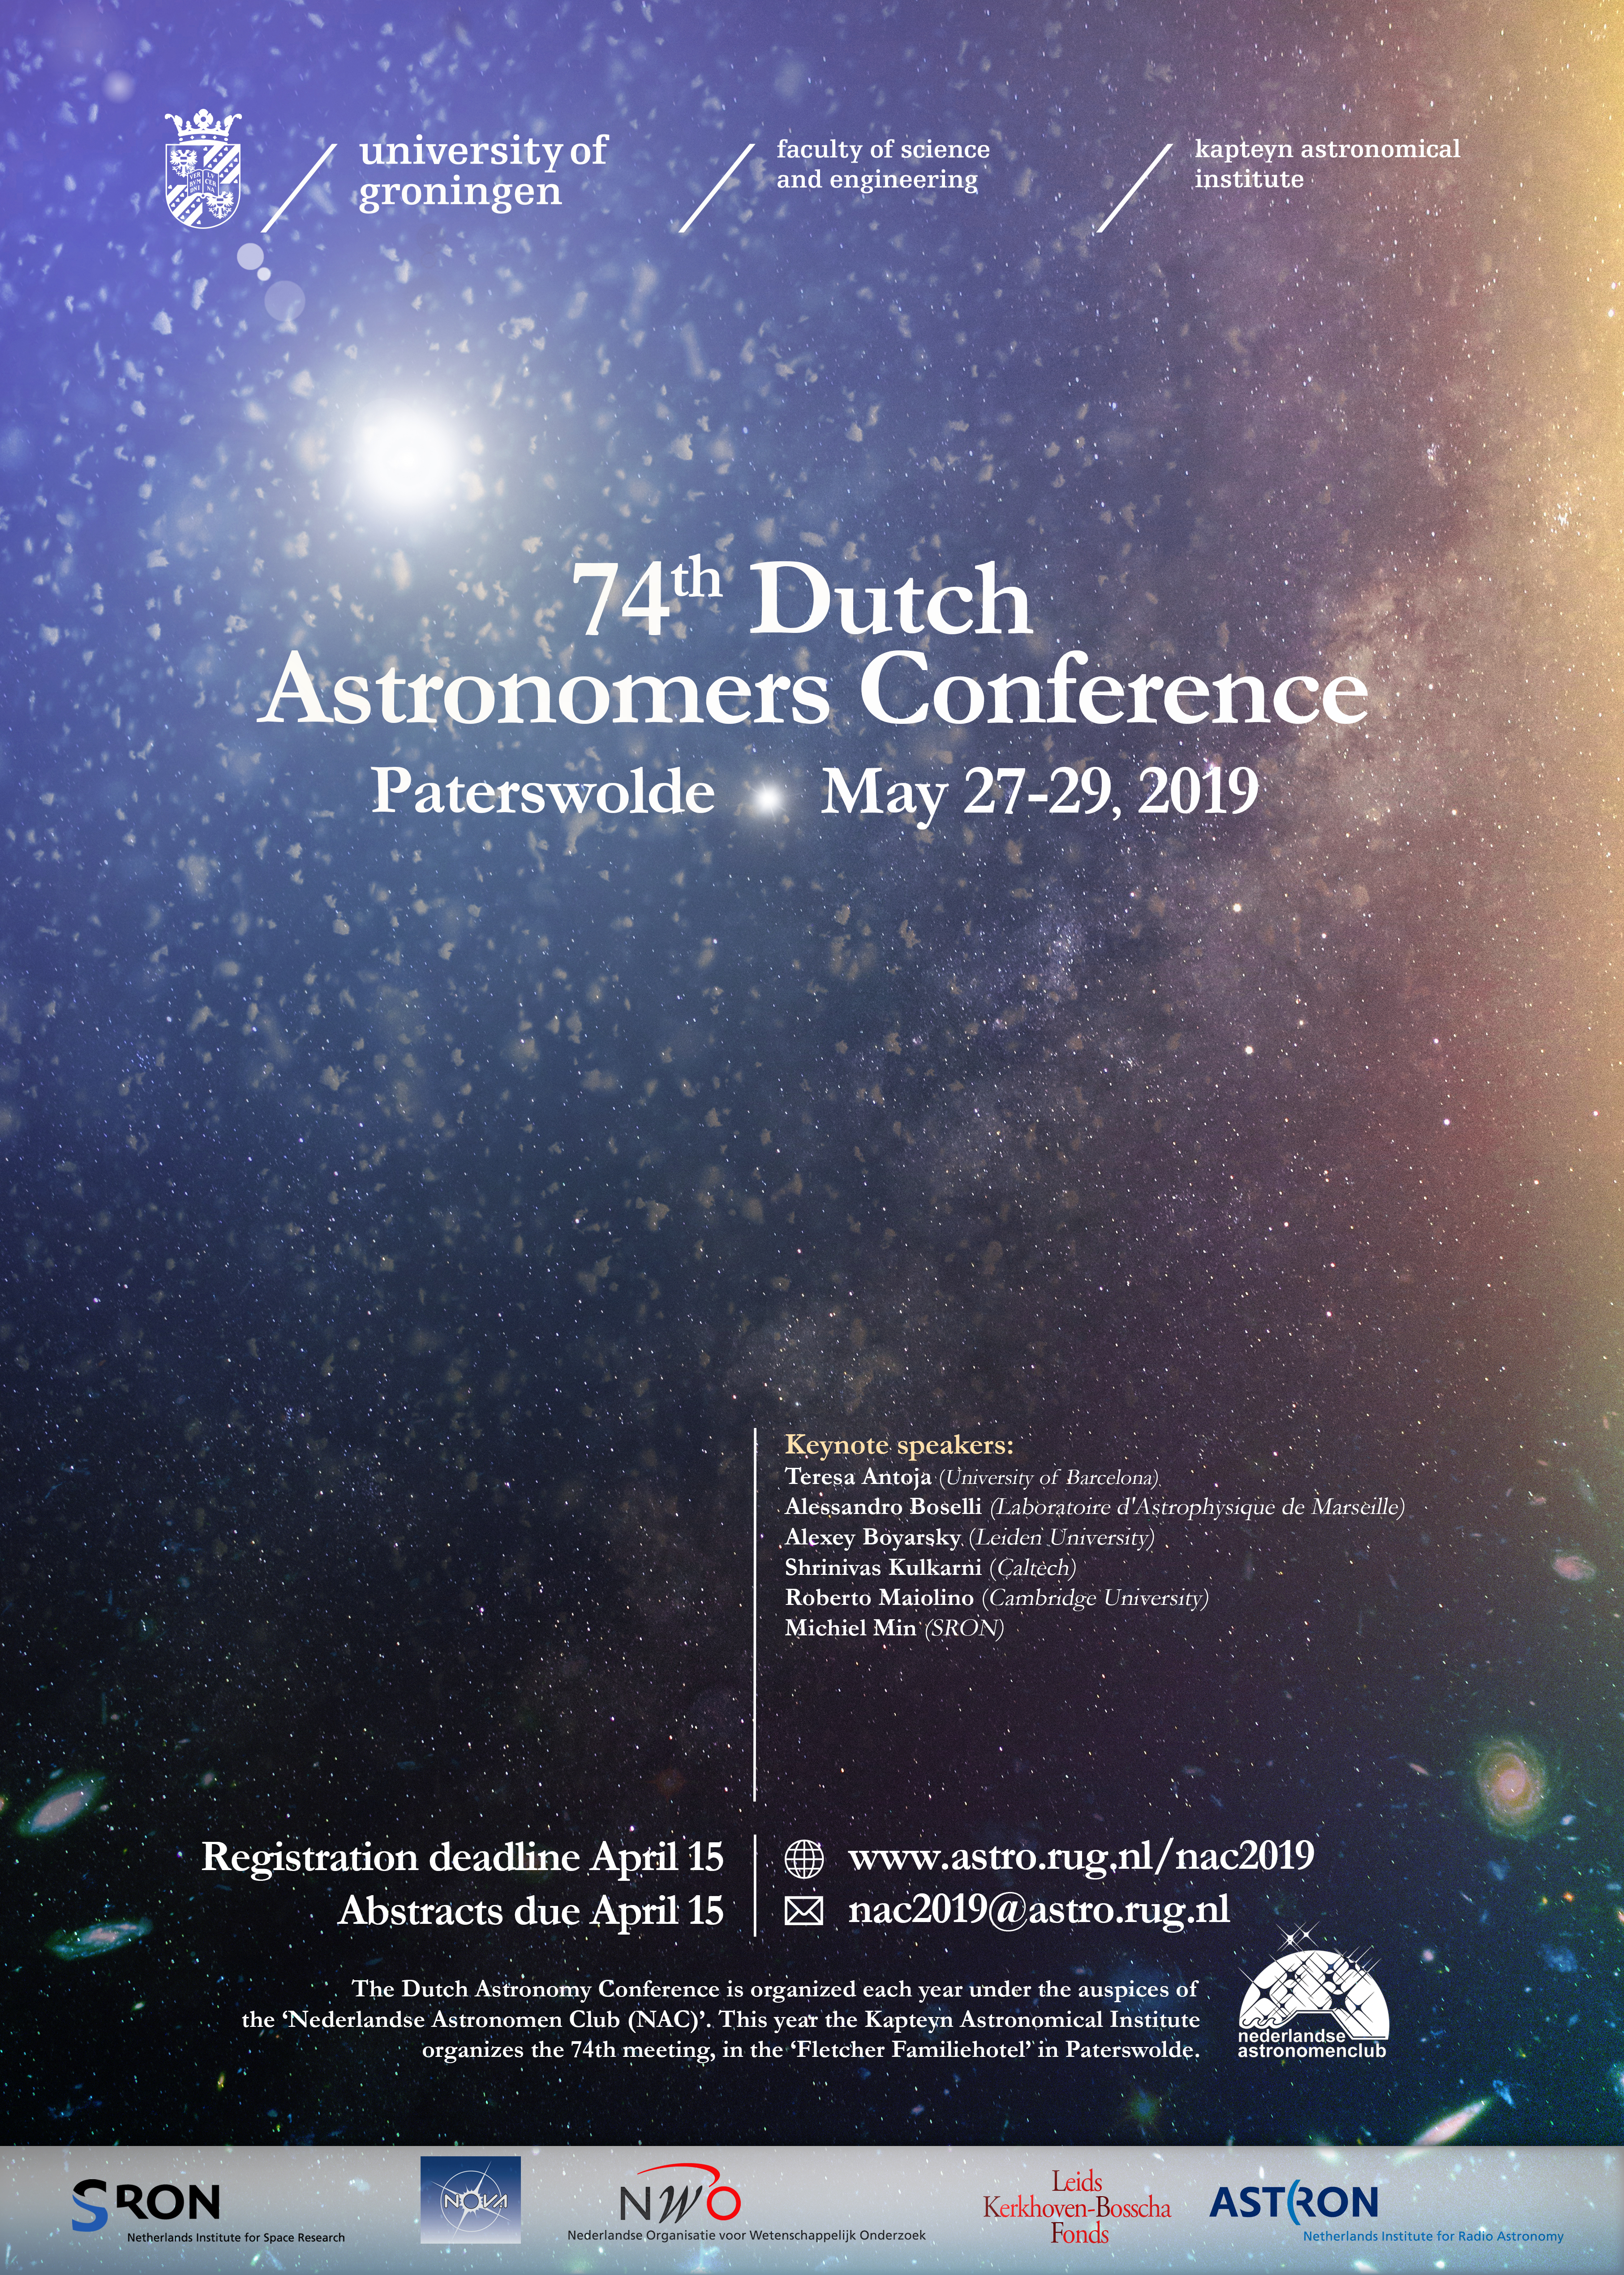 NAC 2019 - Kapteyn Astronomical Institute